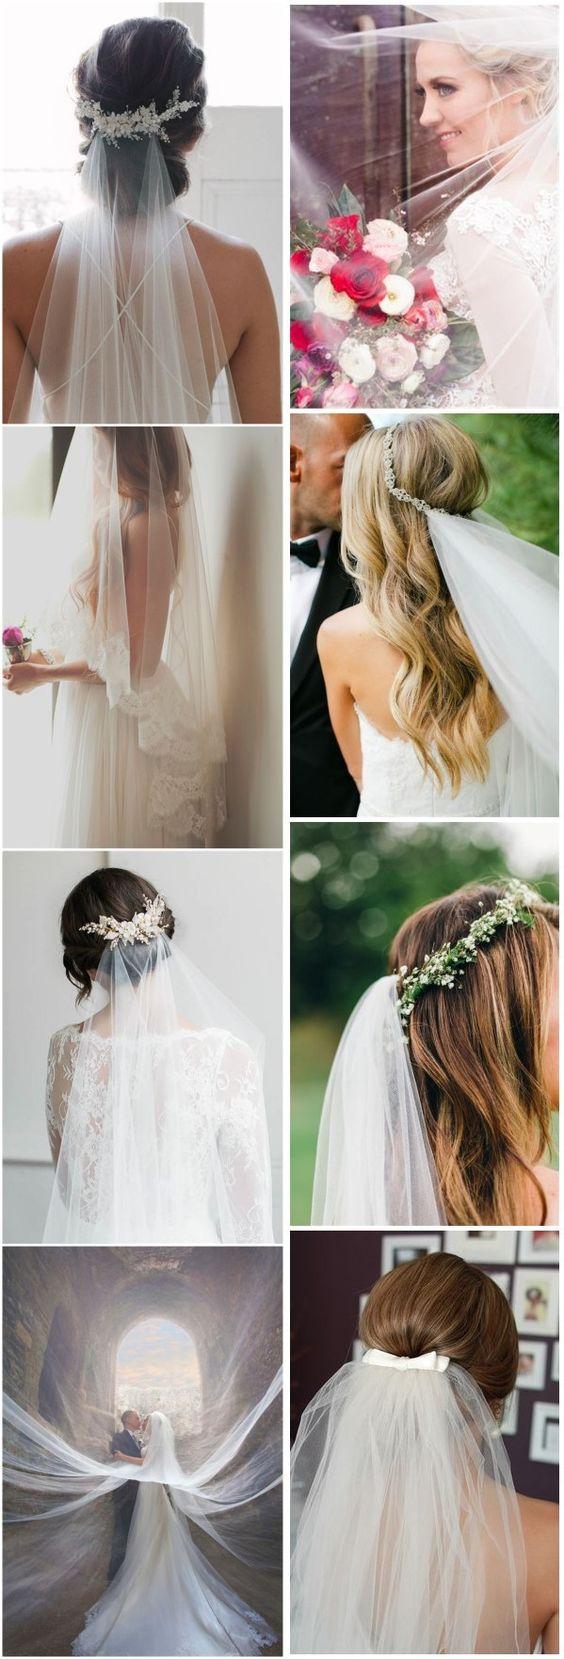 Wedding veils ideas!